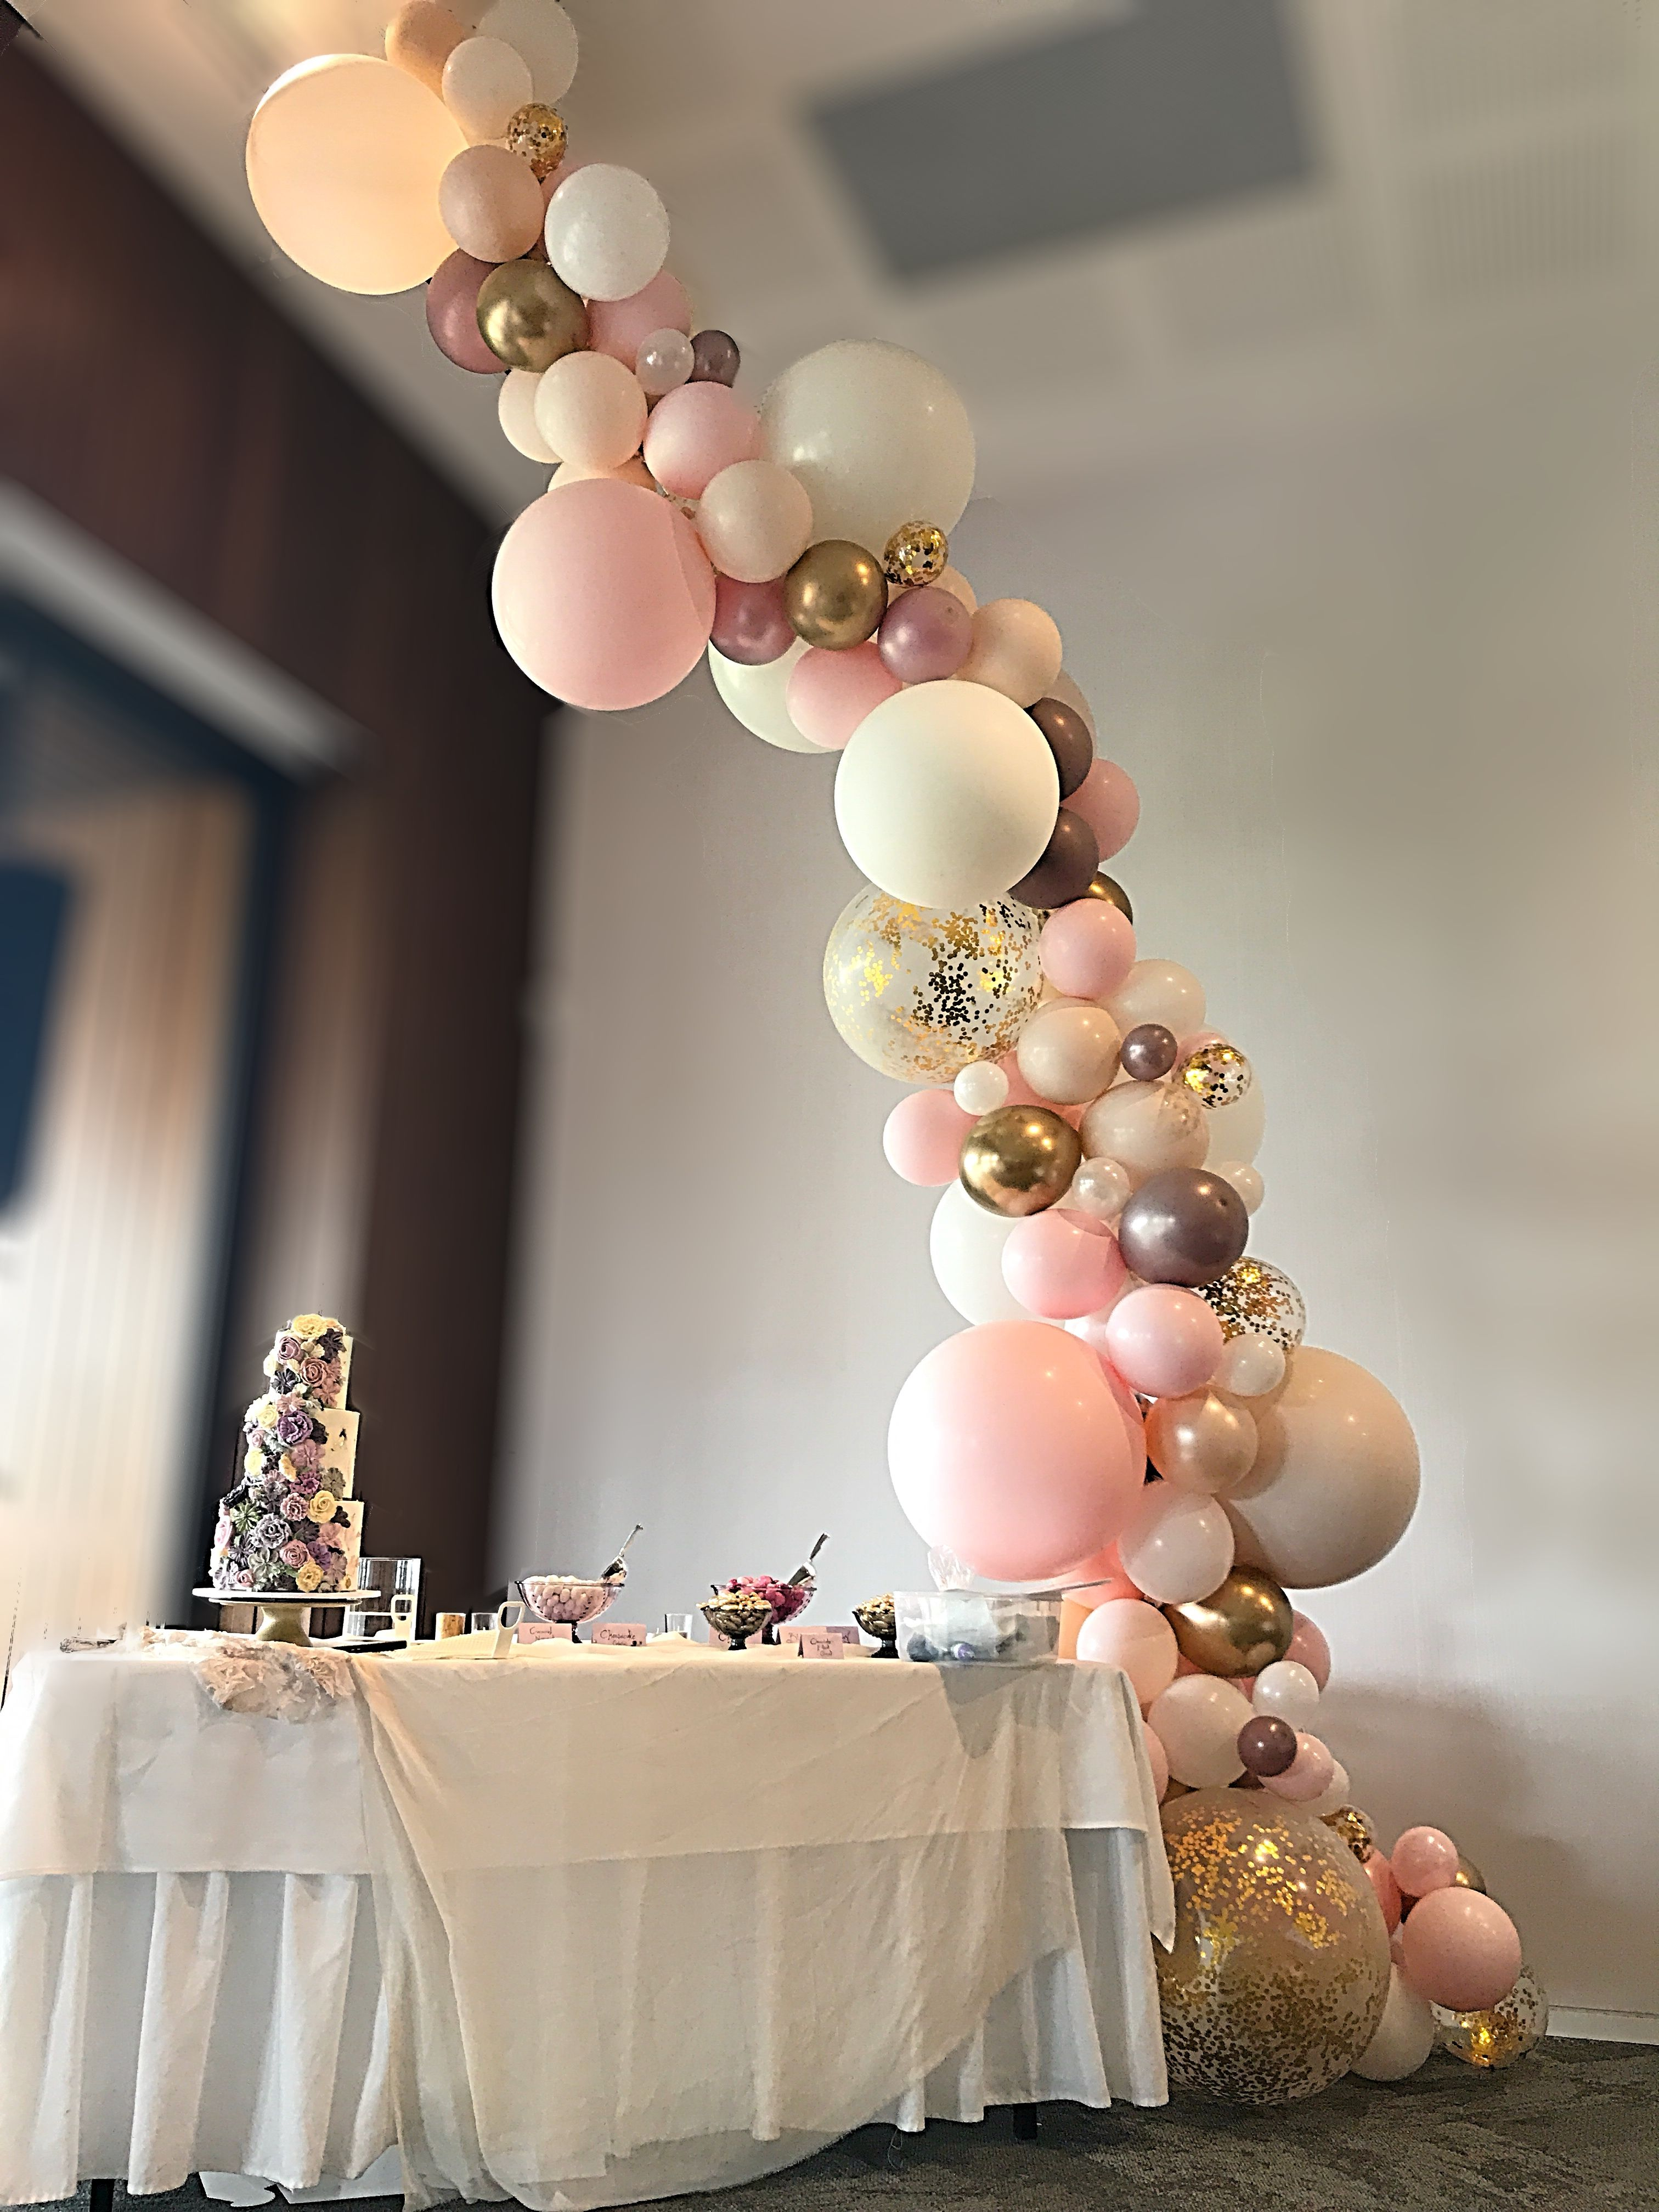 Blush gold confetti and mauve wedding balloon garland stylish blush gold confetti and mauve wedding balloon garland stylish soirees perth junglespirit Choice Image